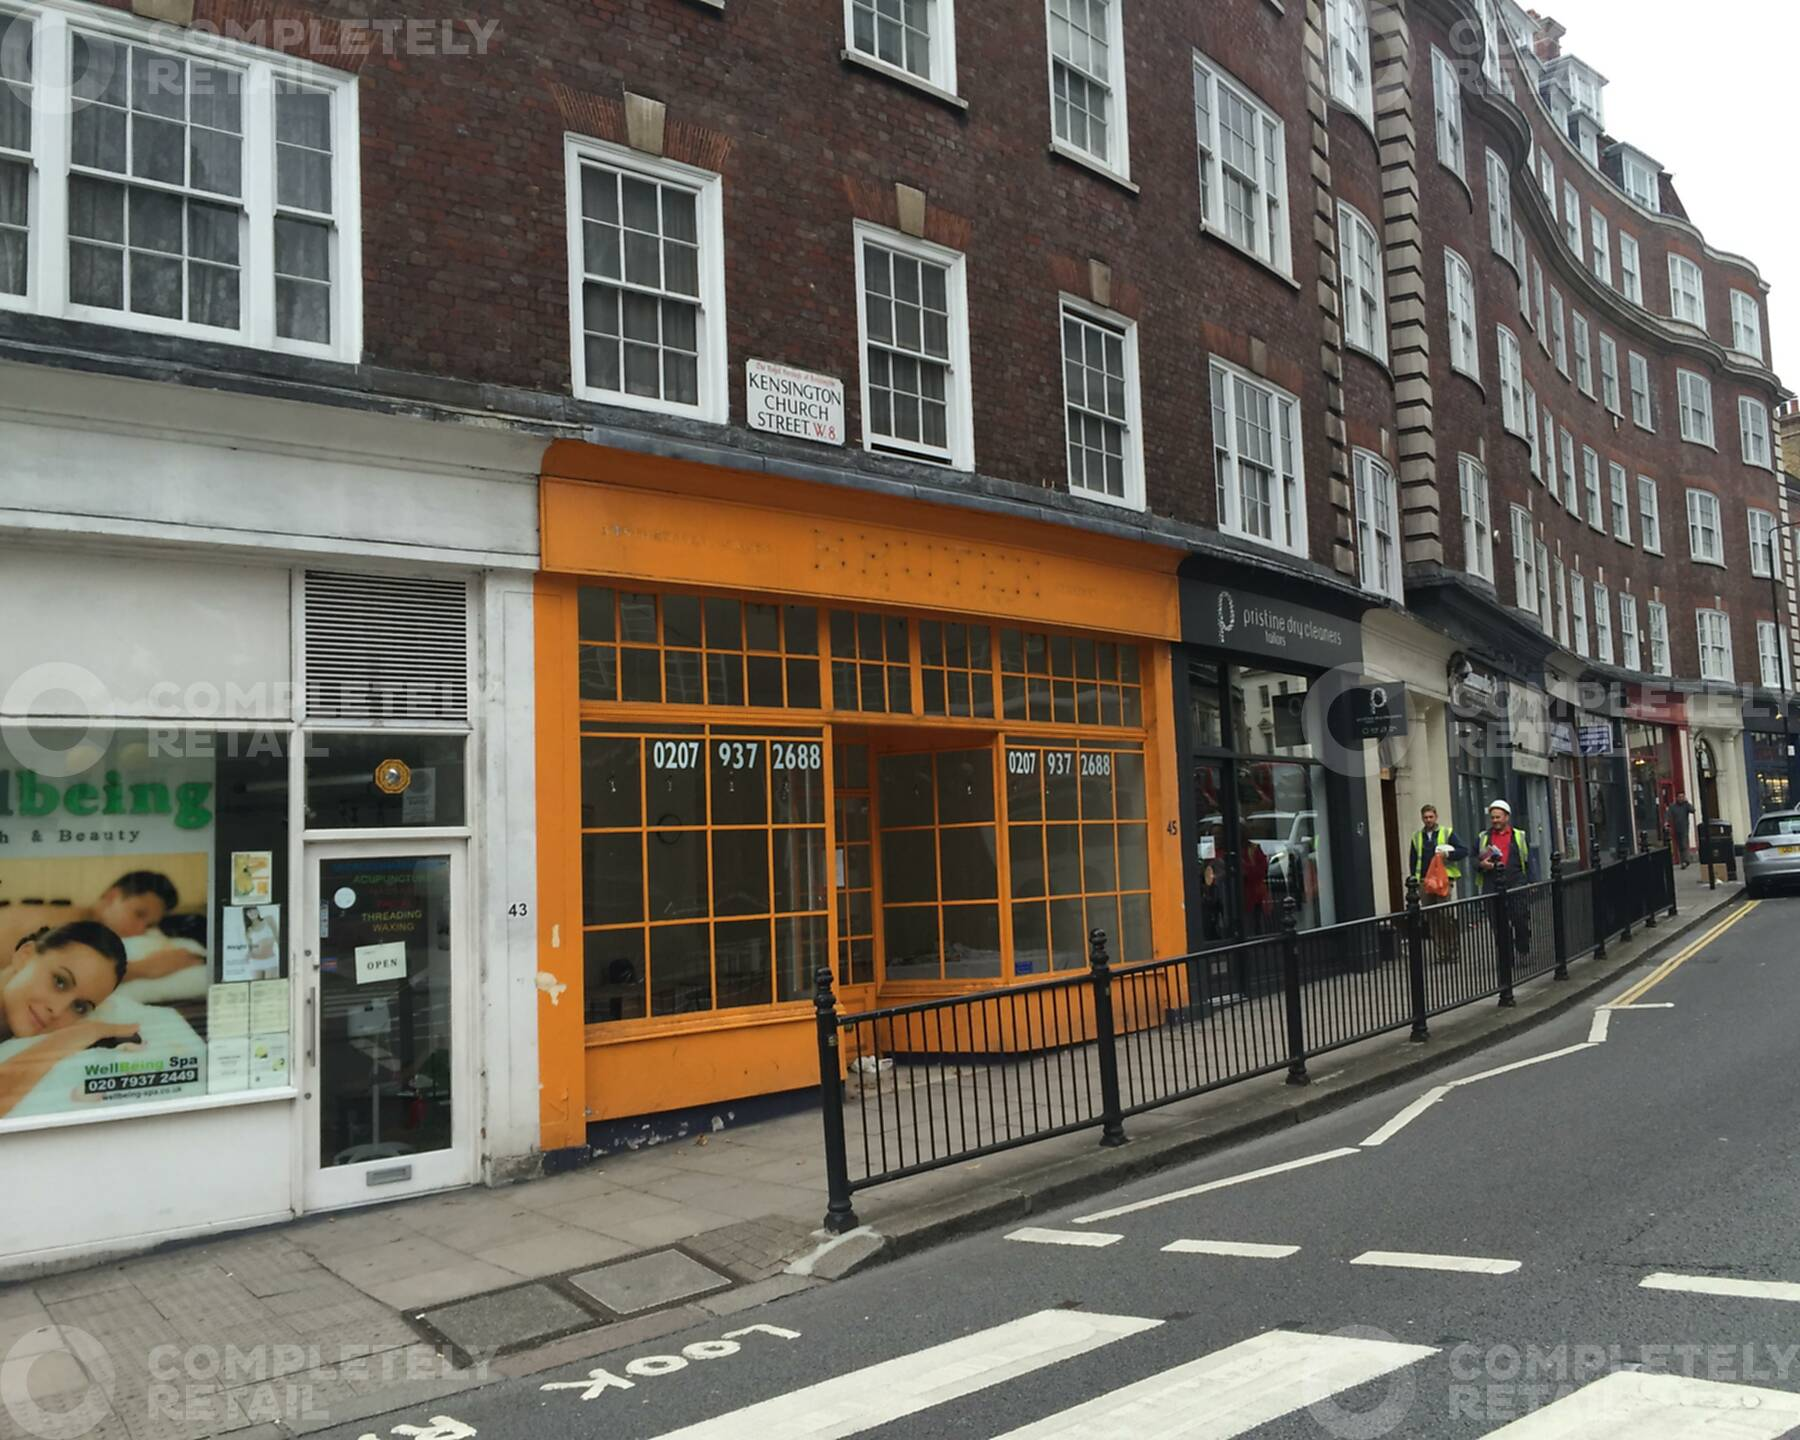 45 Kensington Church Street